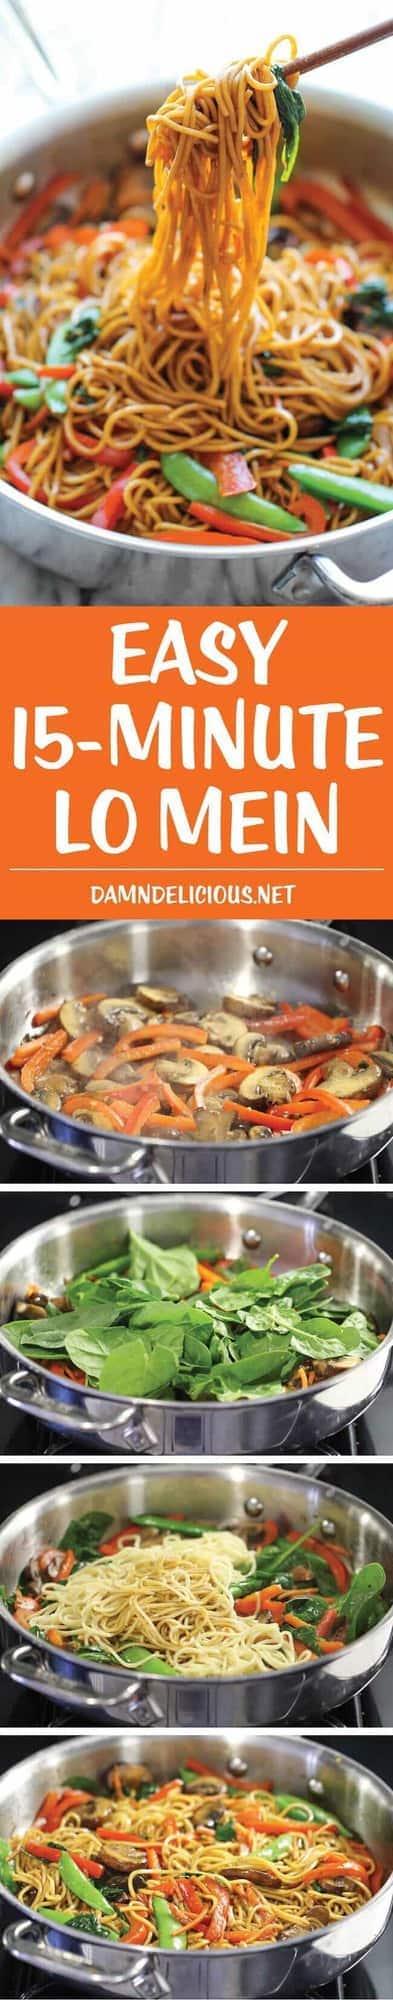 15 minute easy lo-mein